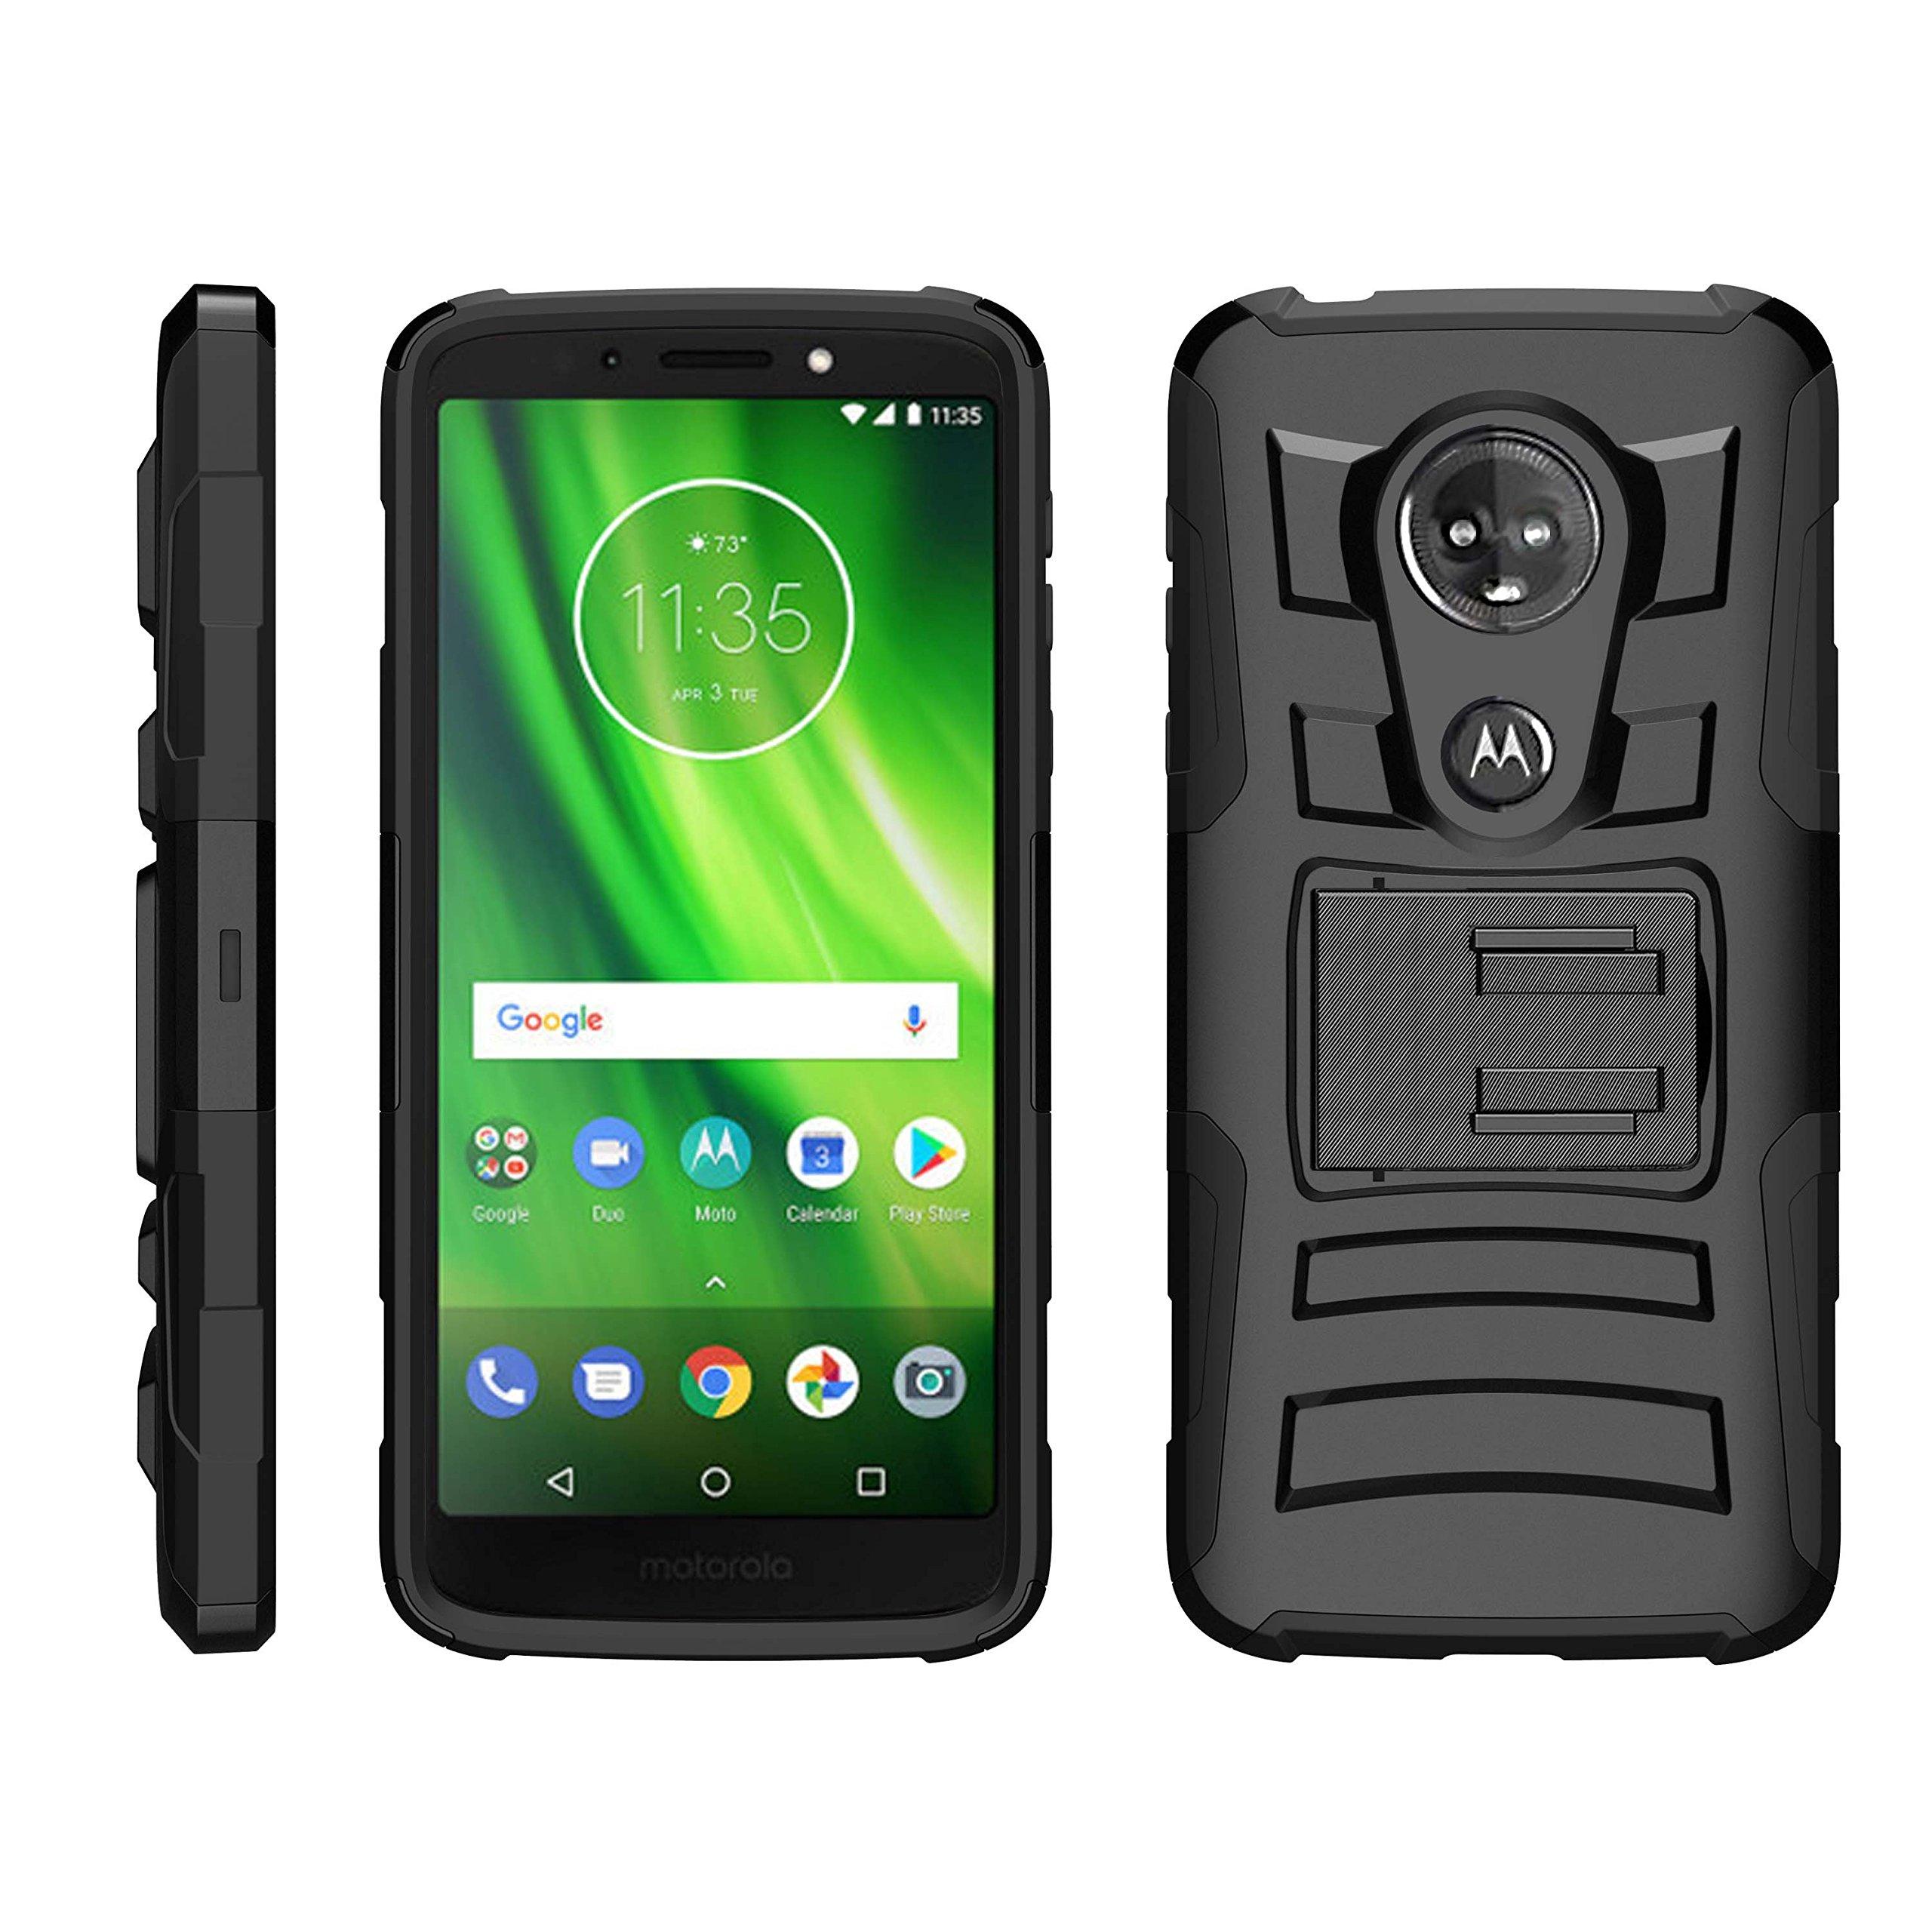 TurtleArmor | Compatible for Motorola Moto G6 Play Case | Moto G6 Forge Case [Hyper Shock] Armor Hybrid Cover Kickstand Impact Holster Belt Clip Sports and Games Design - Black